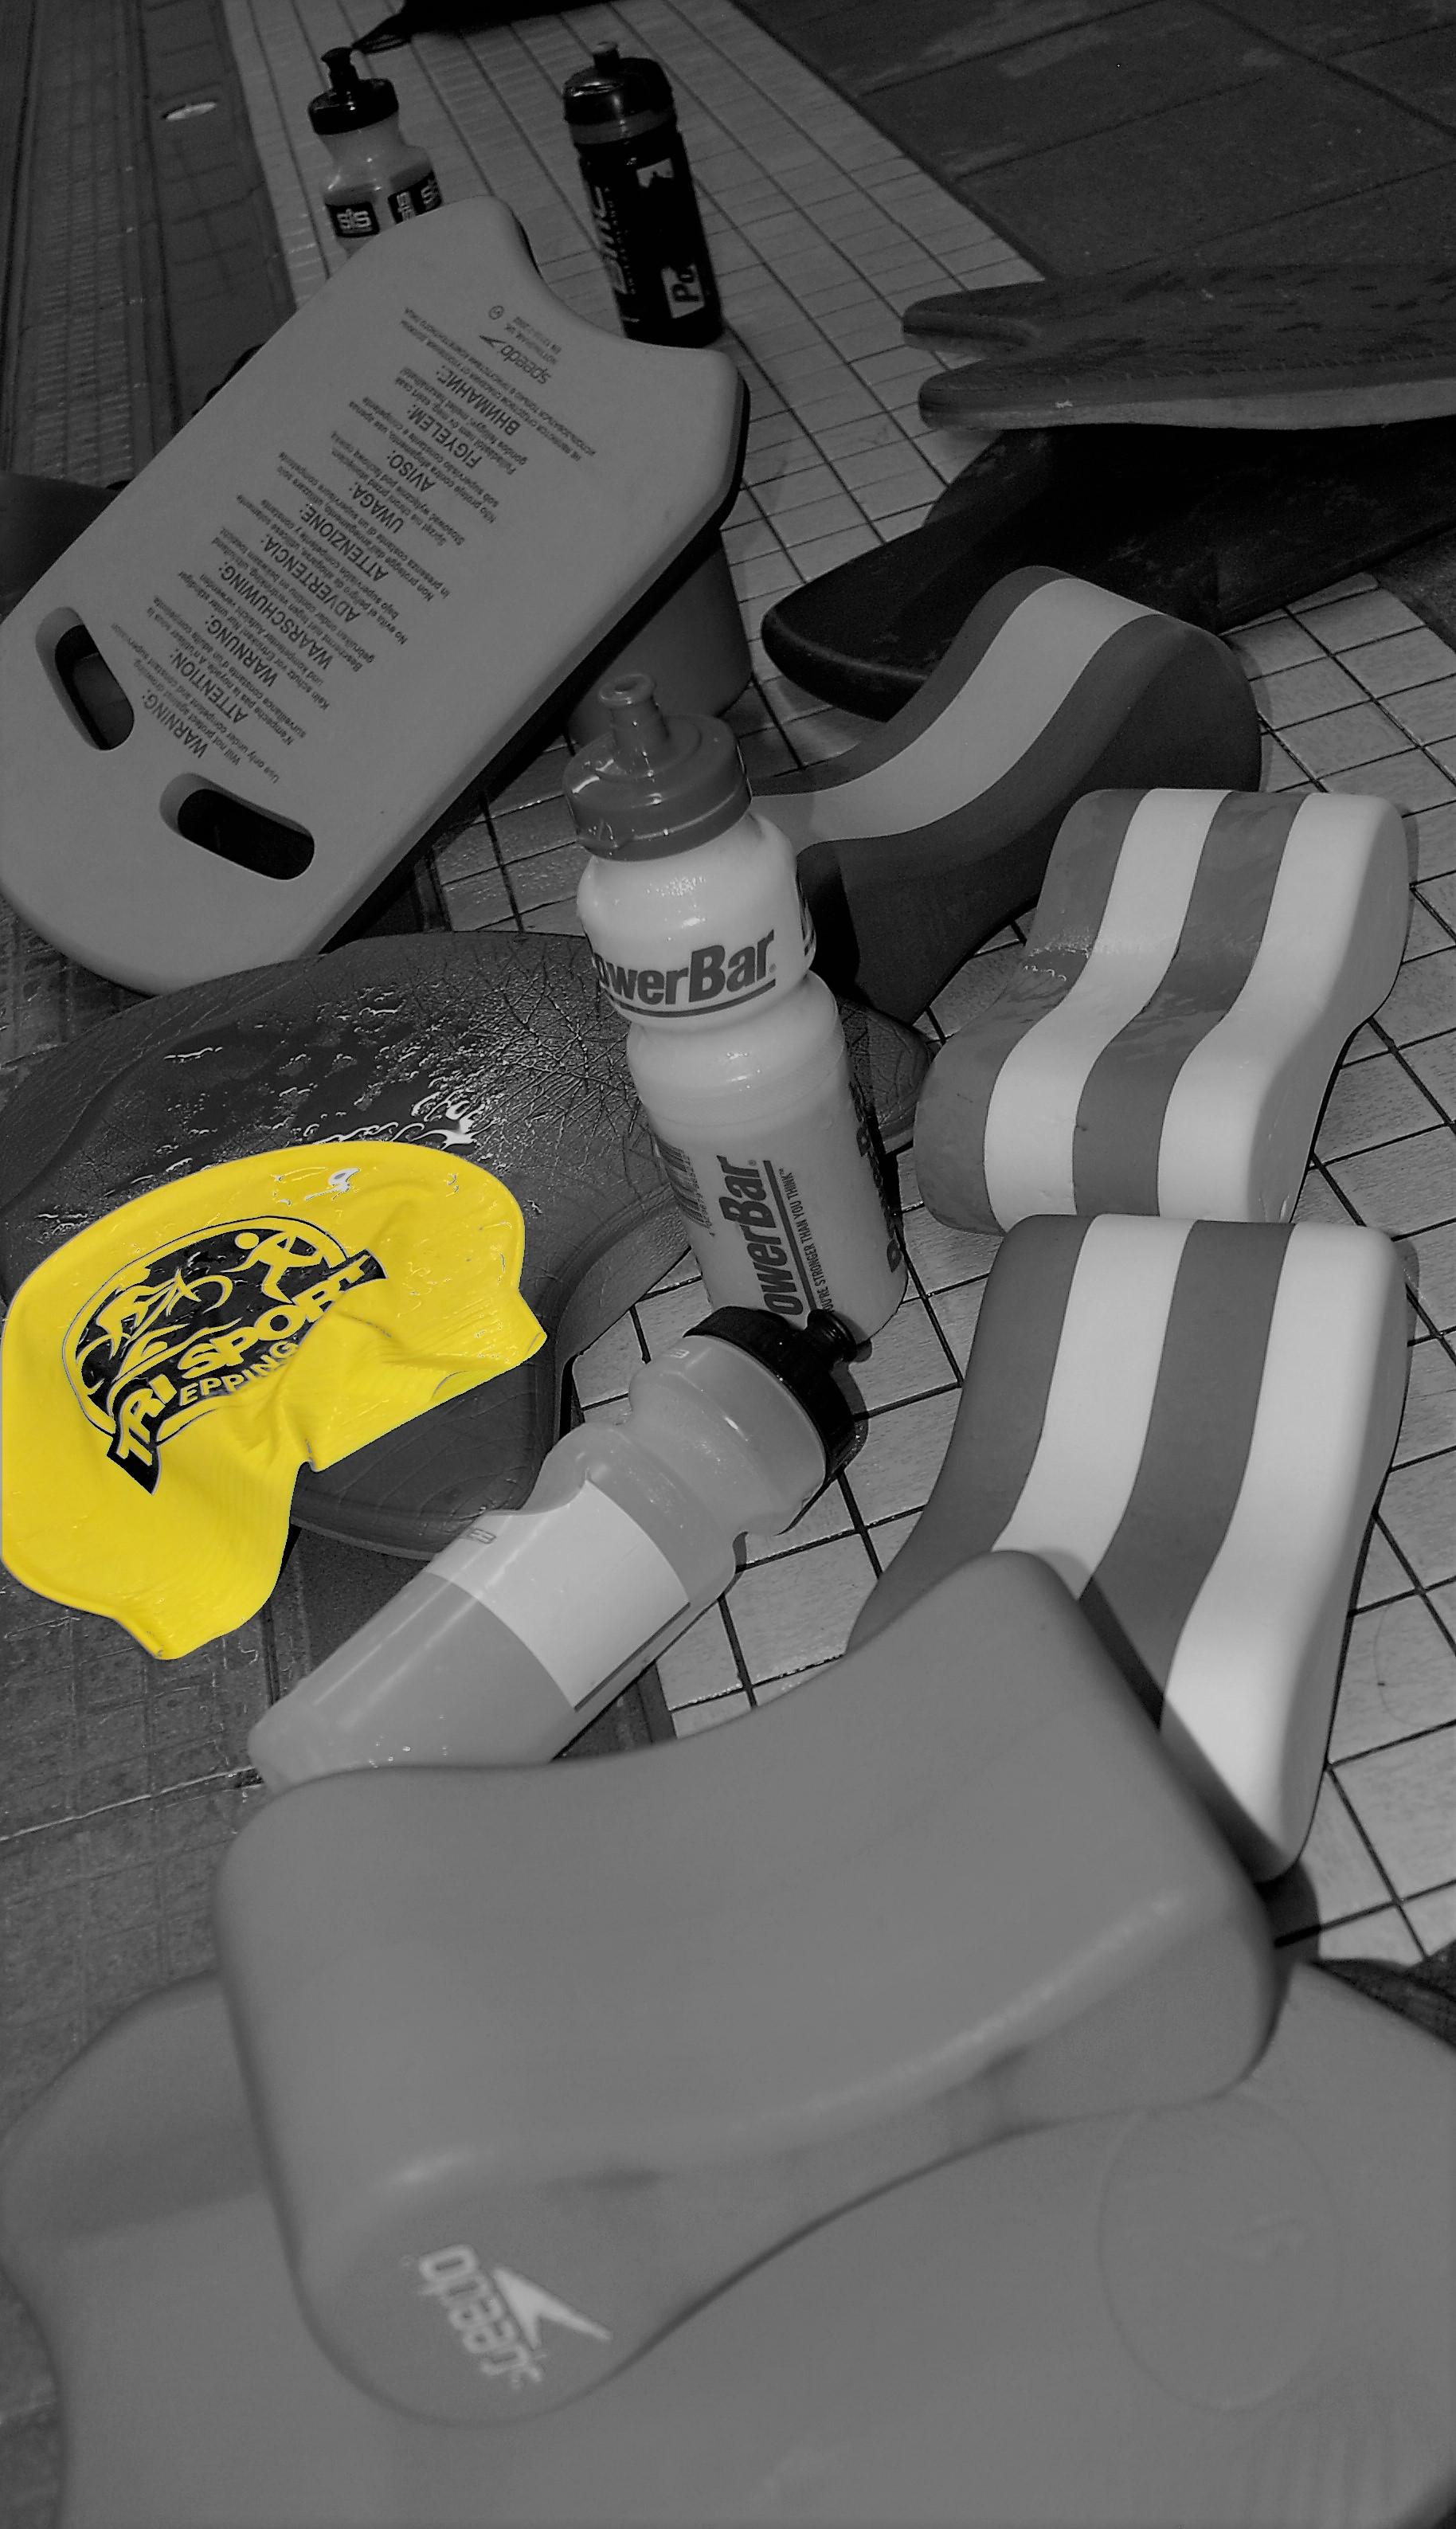 Poolside stuff 2.jpg